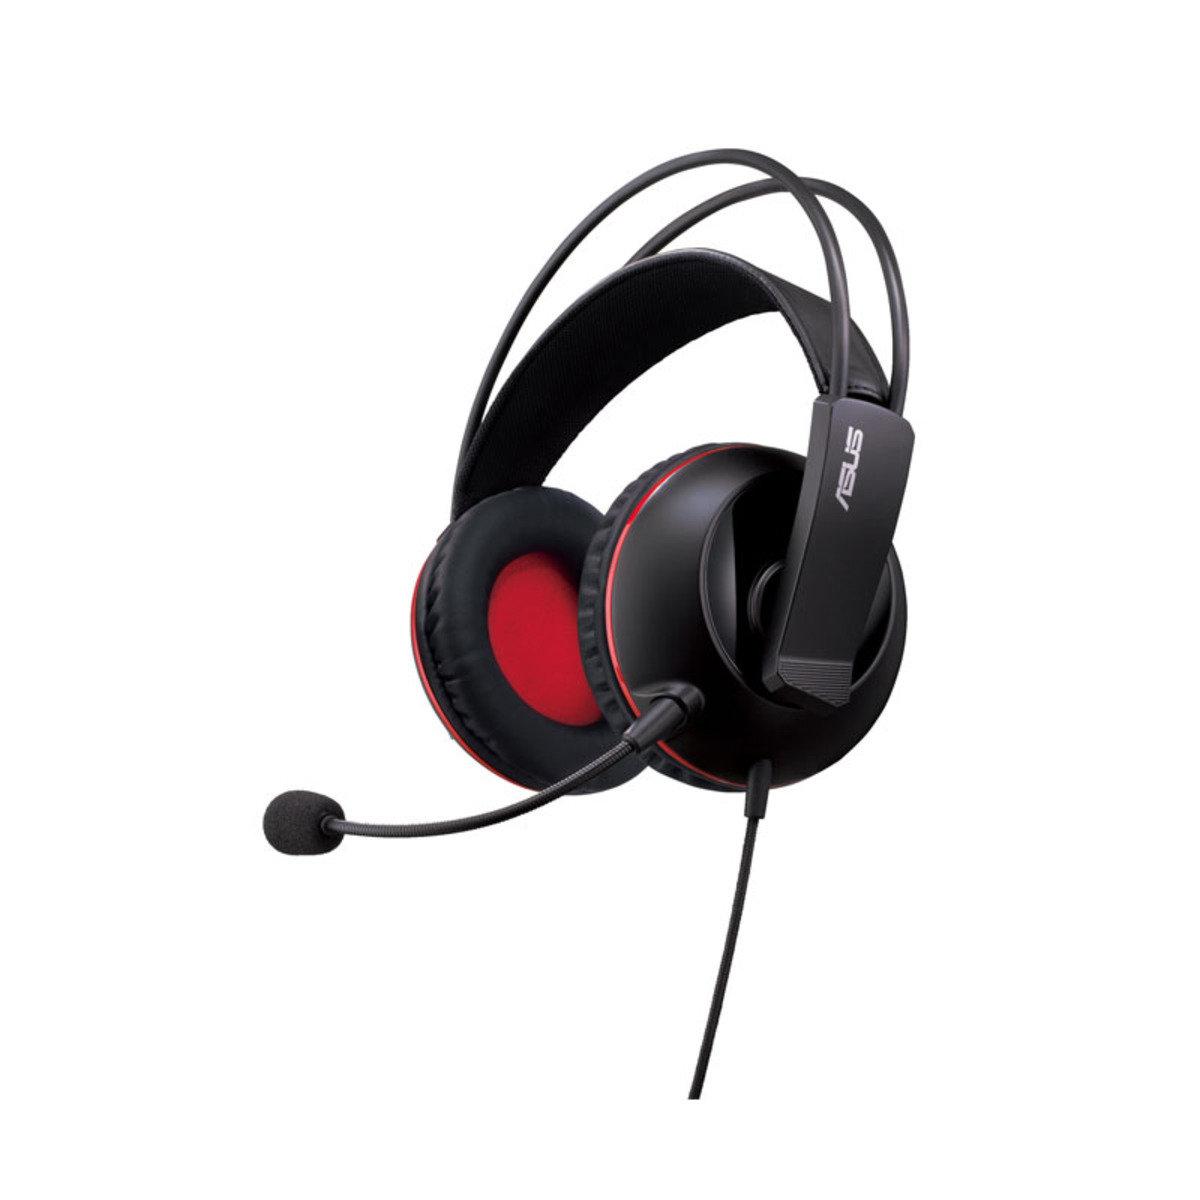 60mm頭戴式電競耳機 CERBERUS